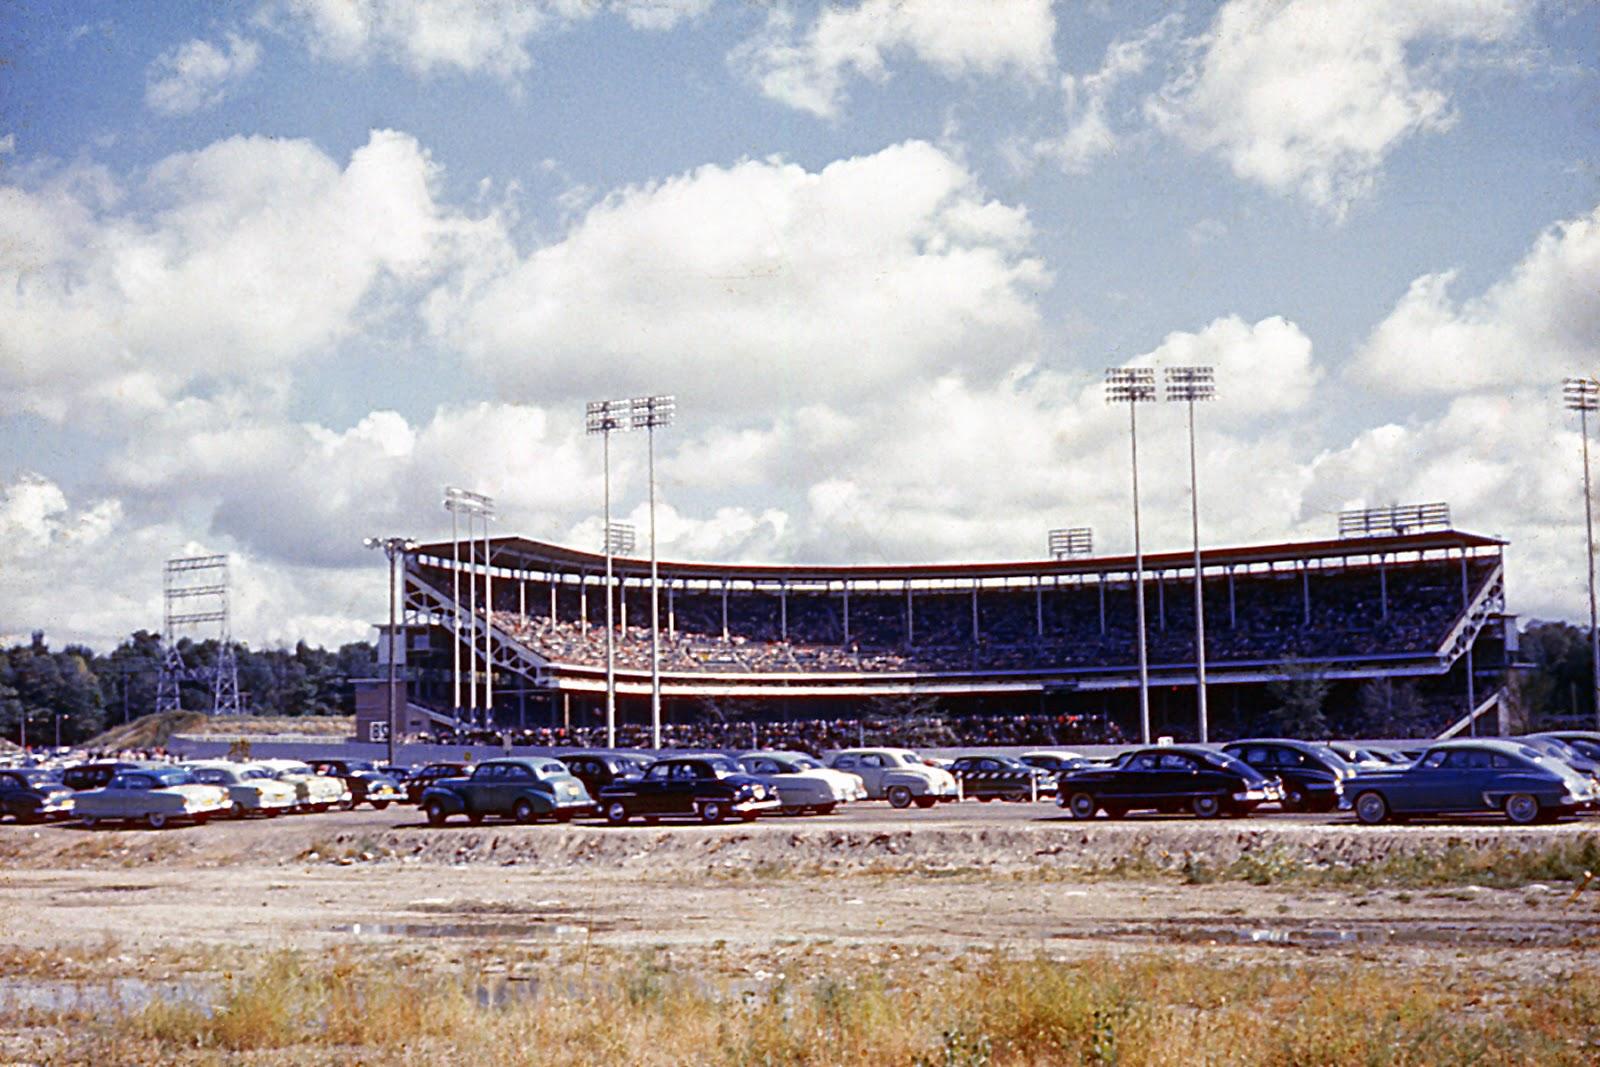 1000+ images about Milwaukee County Stadium on Pinterest ...